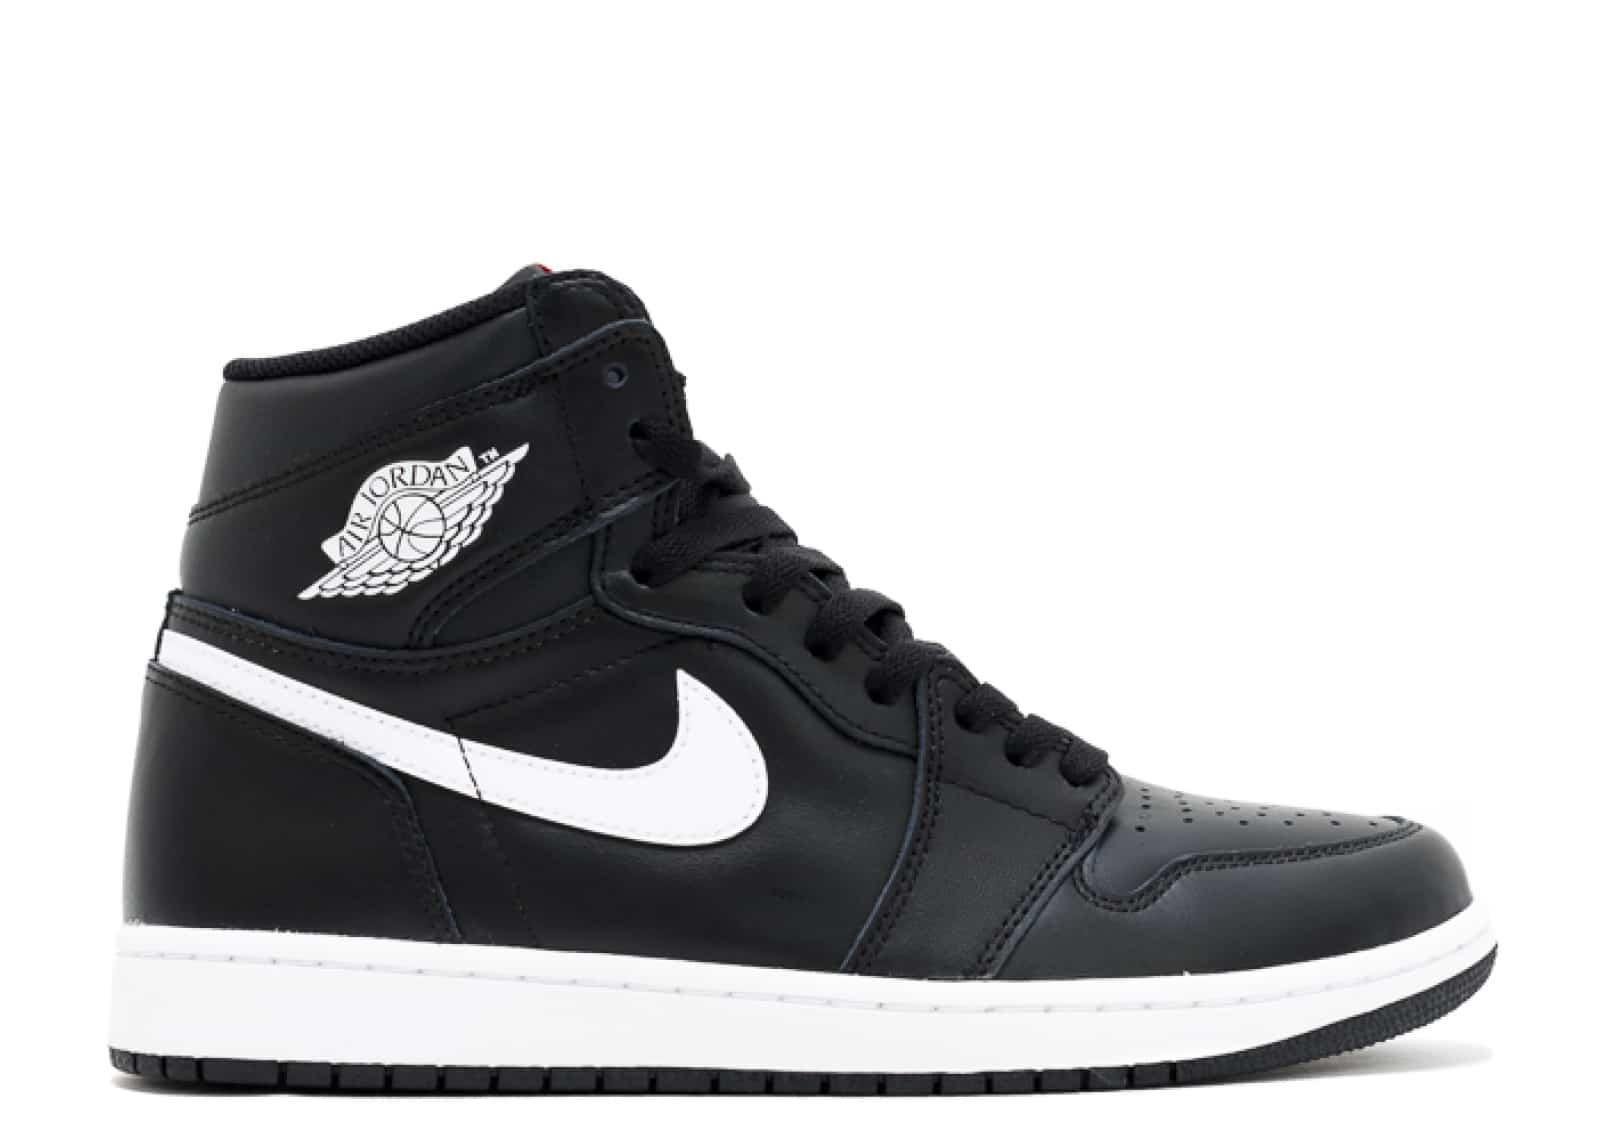 Fake Air Jordans Smuggled In to New York